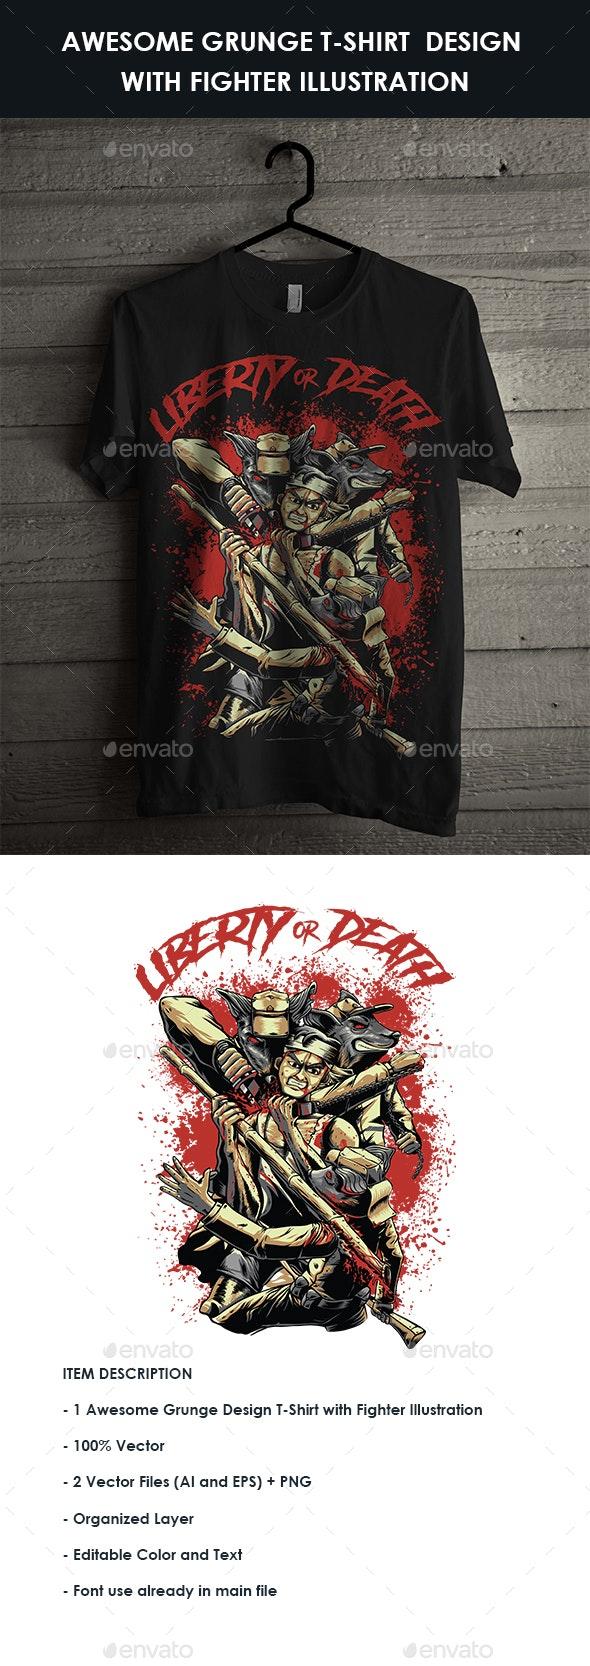 Grunge Design T-Shirt with Bloody Fight Illustration - Grunge Designs